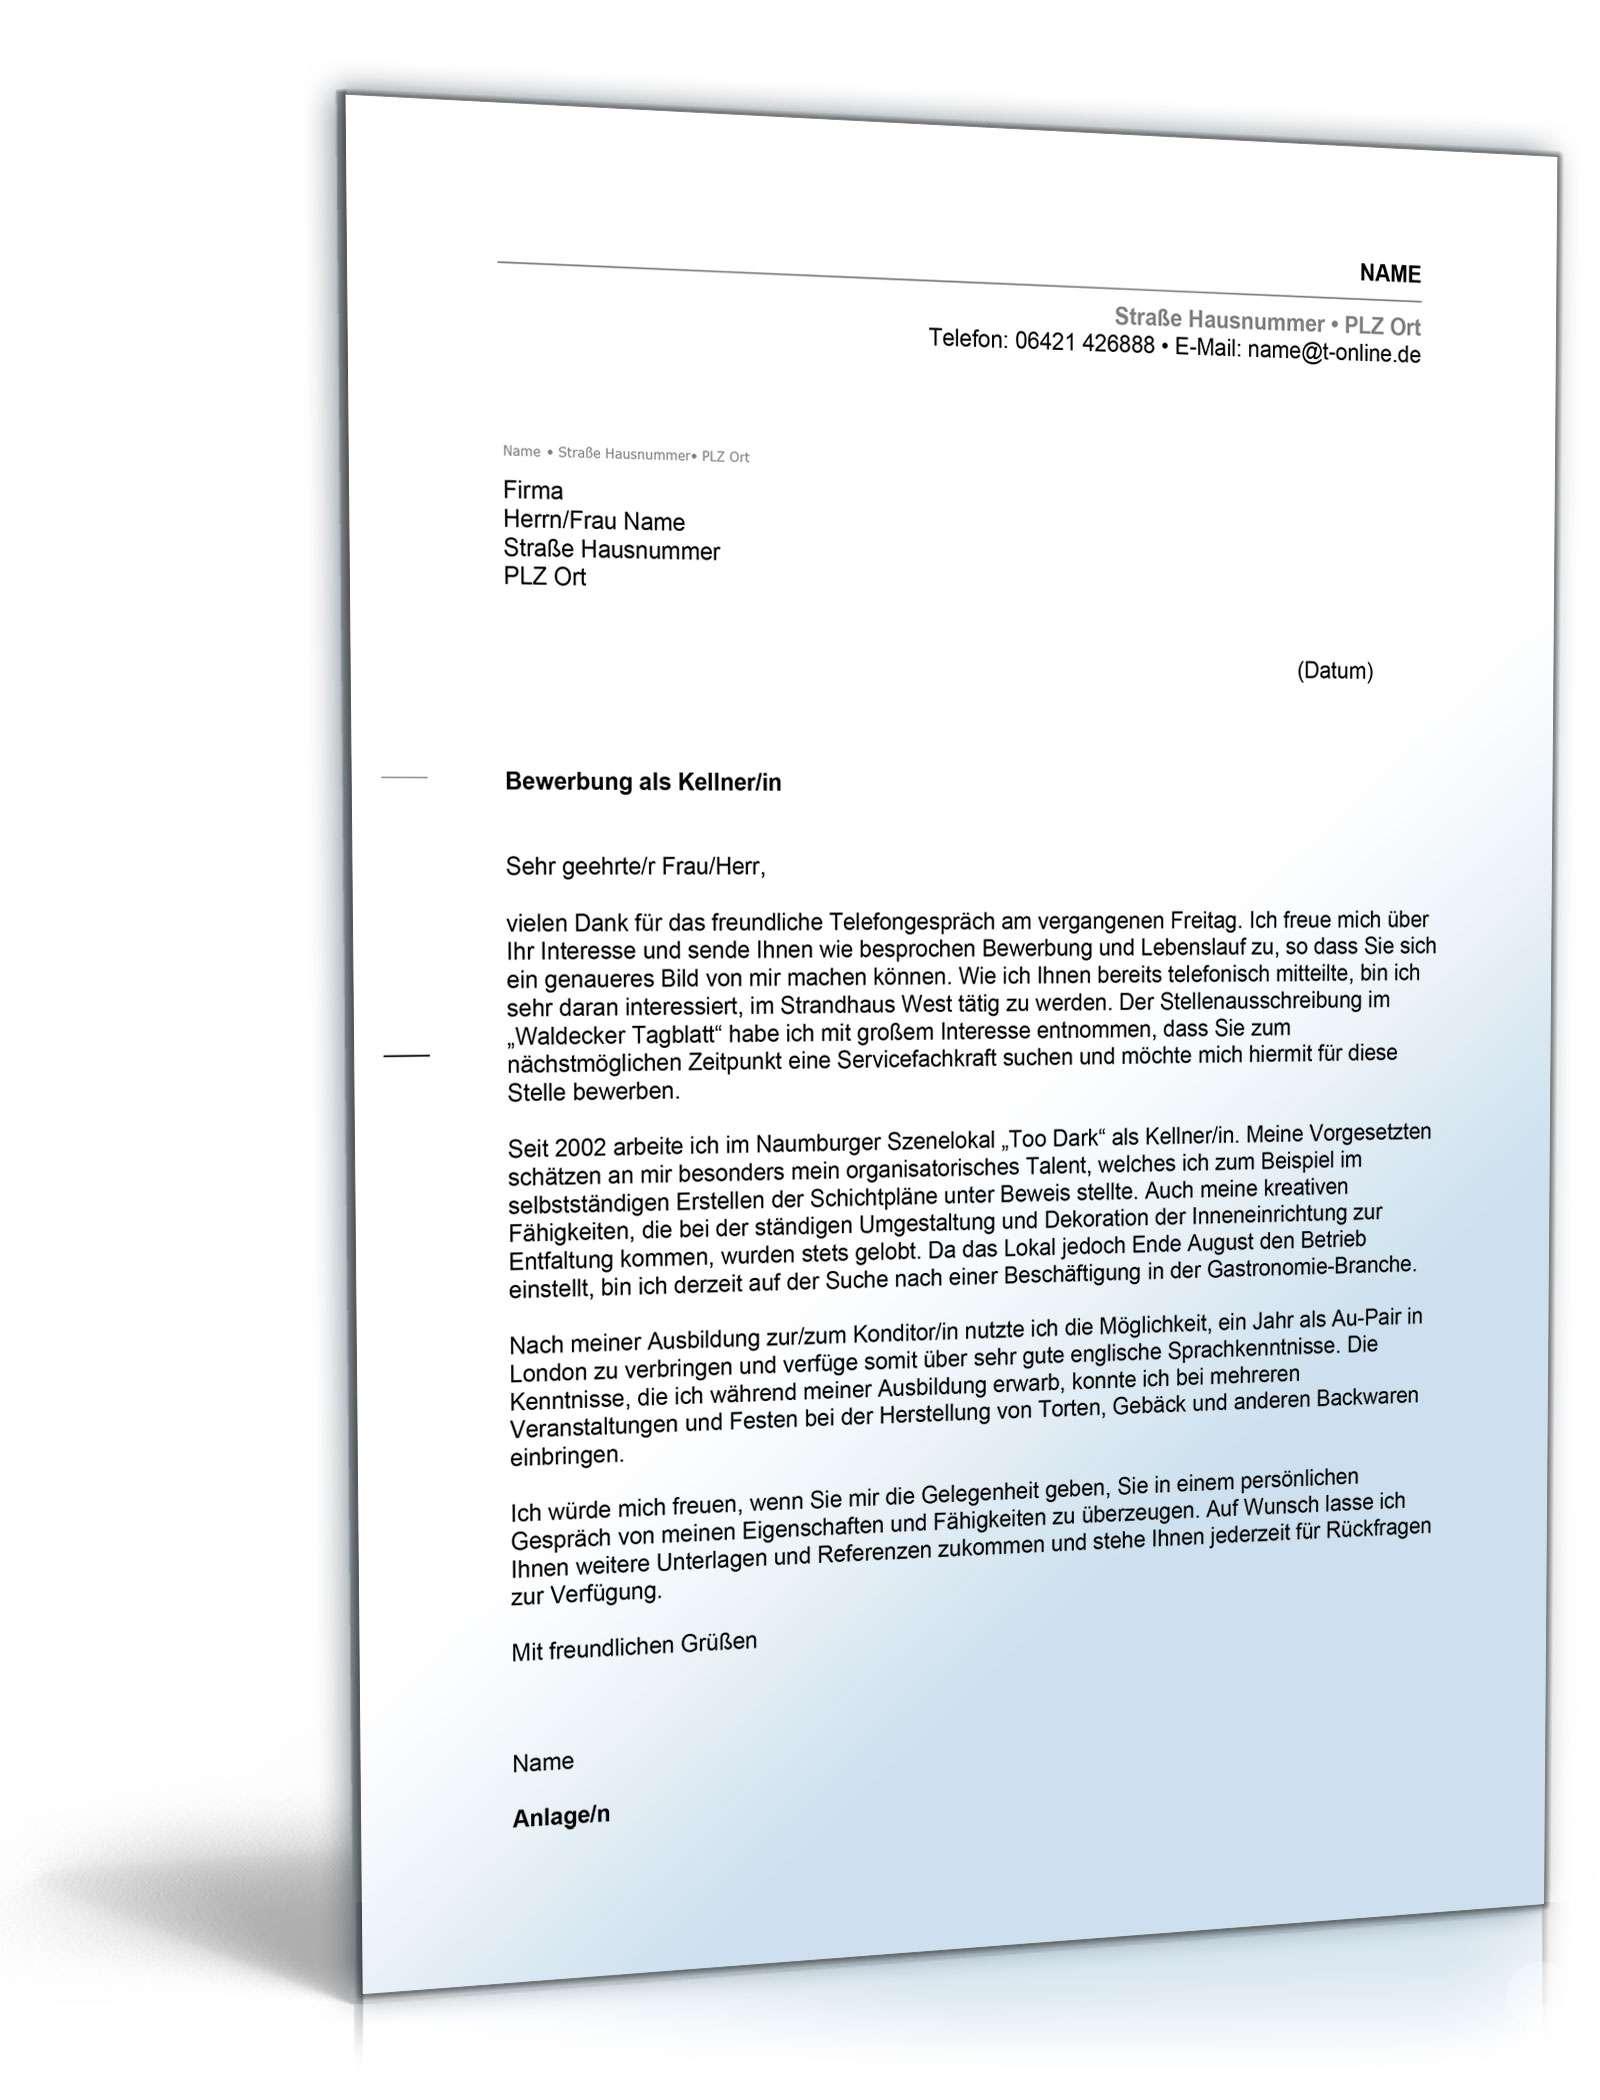 Anschreiben Bewerbung Kellner Muster Zum Download